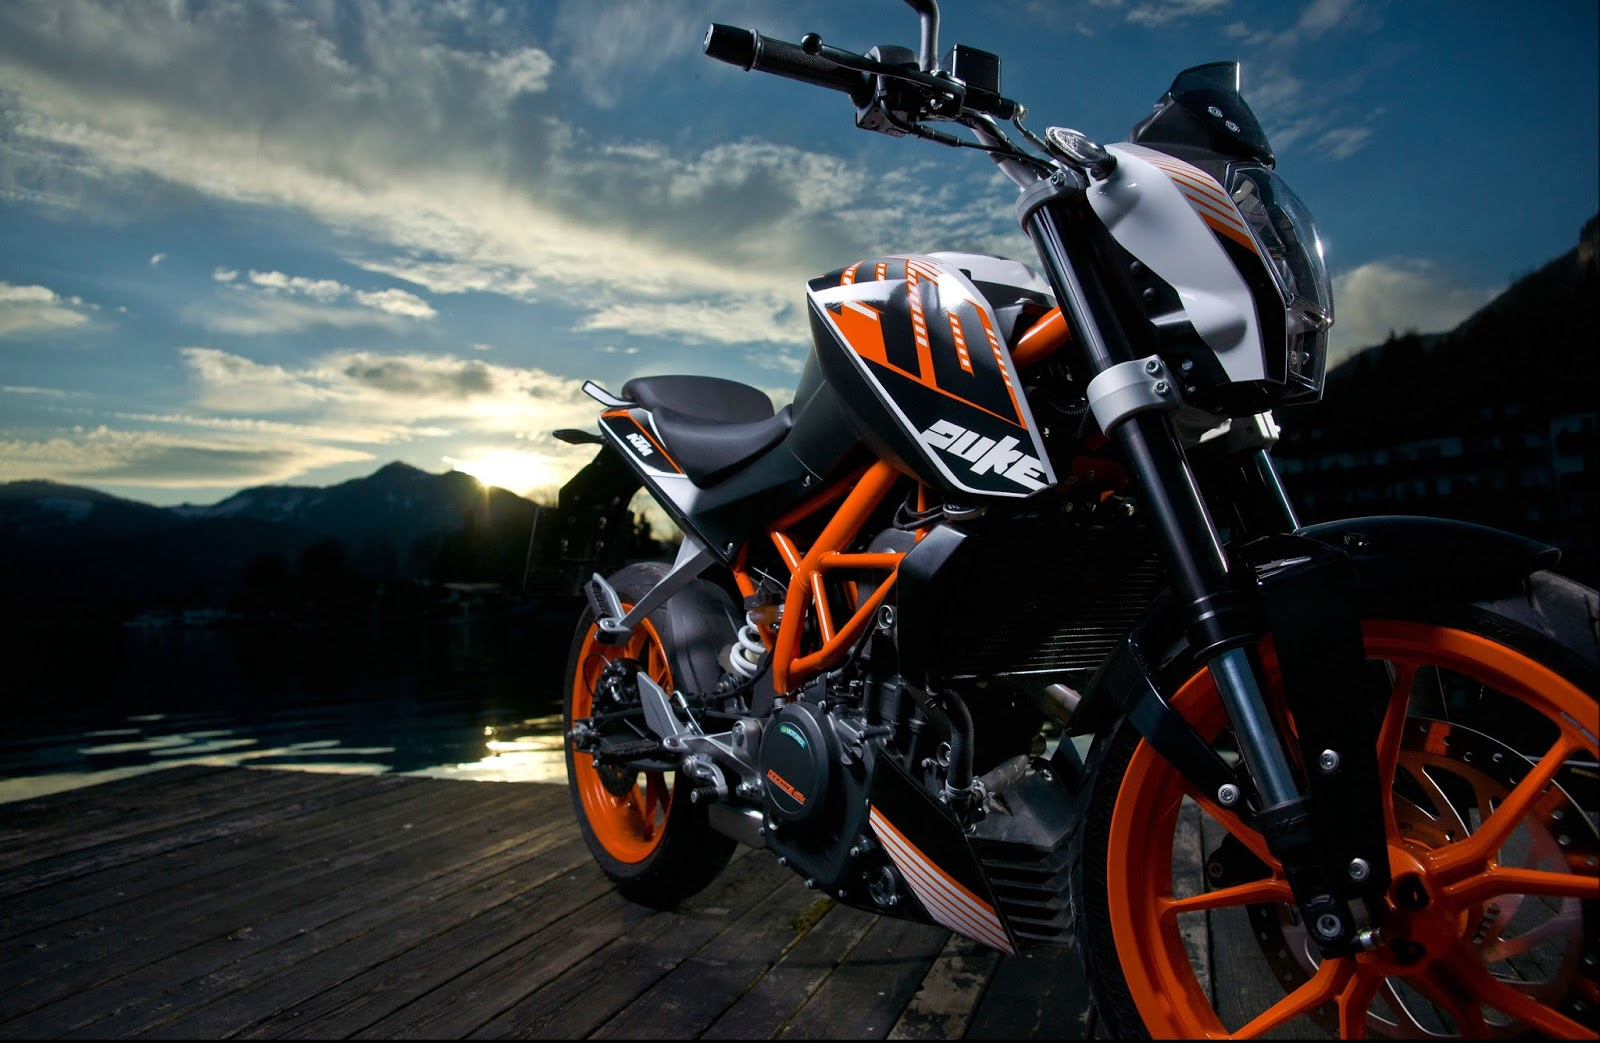 Ray Superbike 2016 Malezijski Top 5 Naked Bike-7886